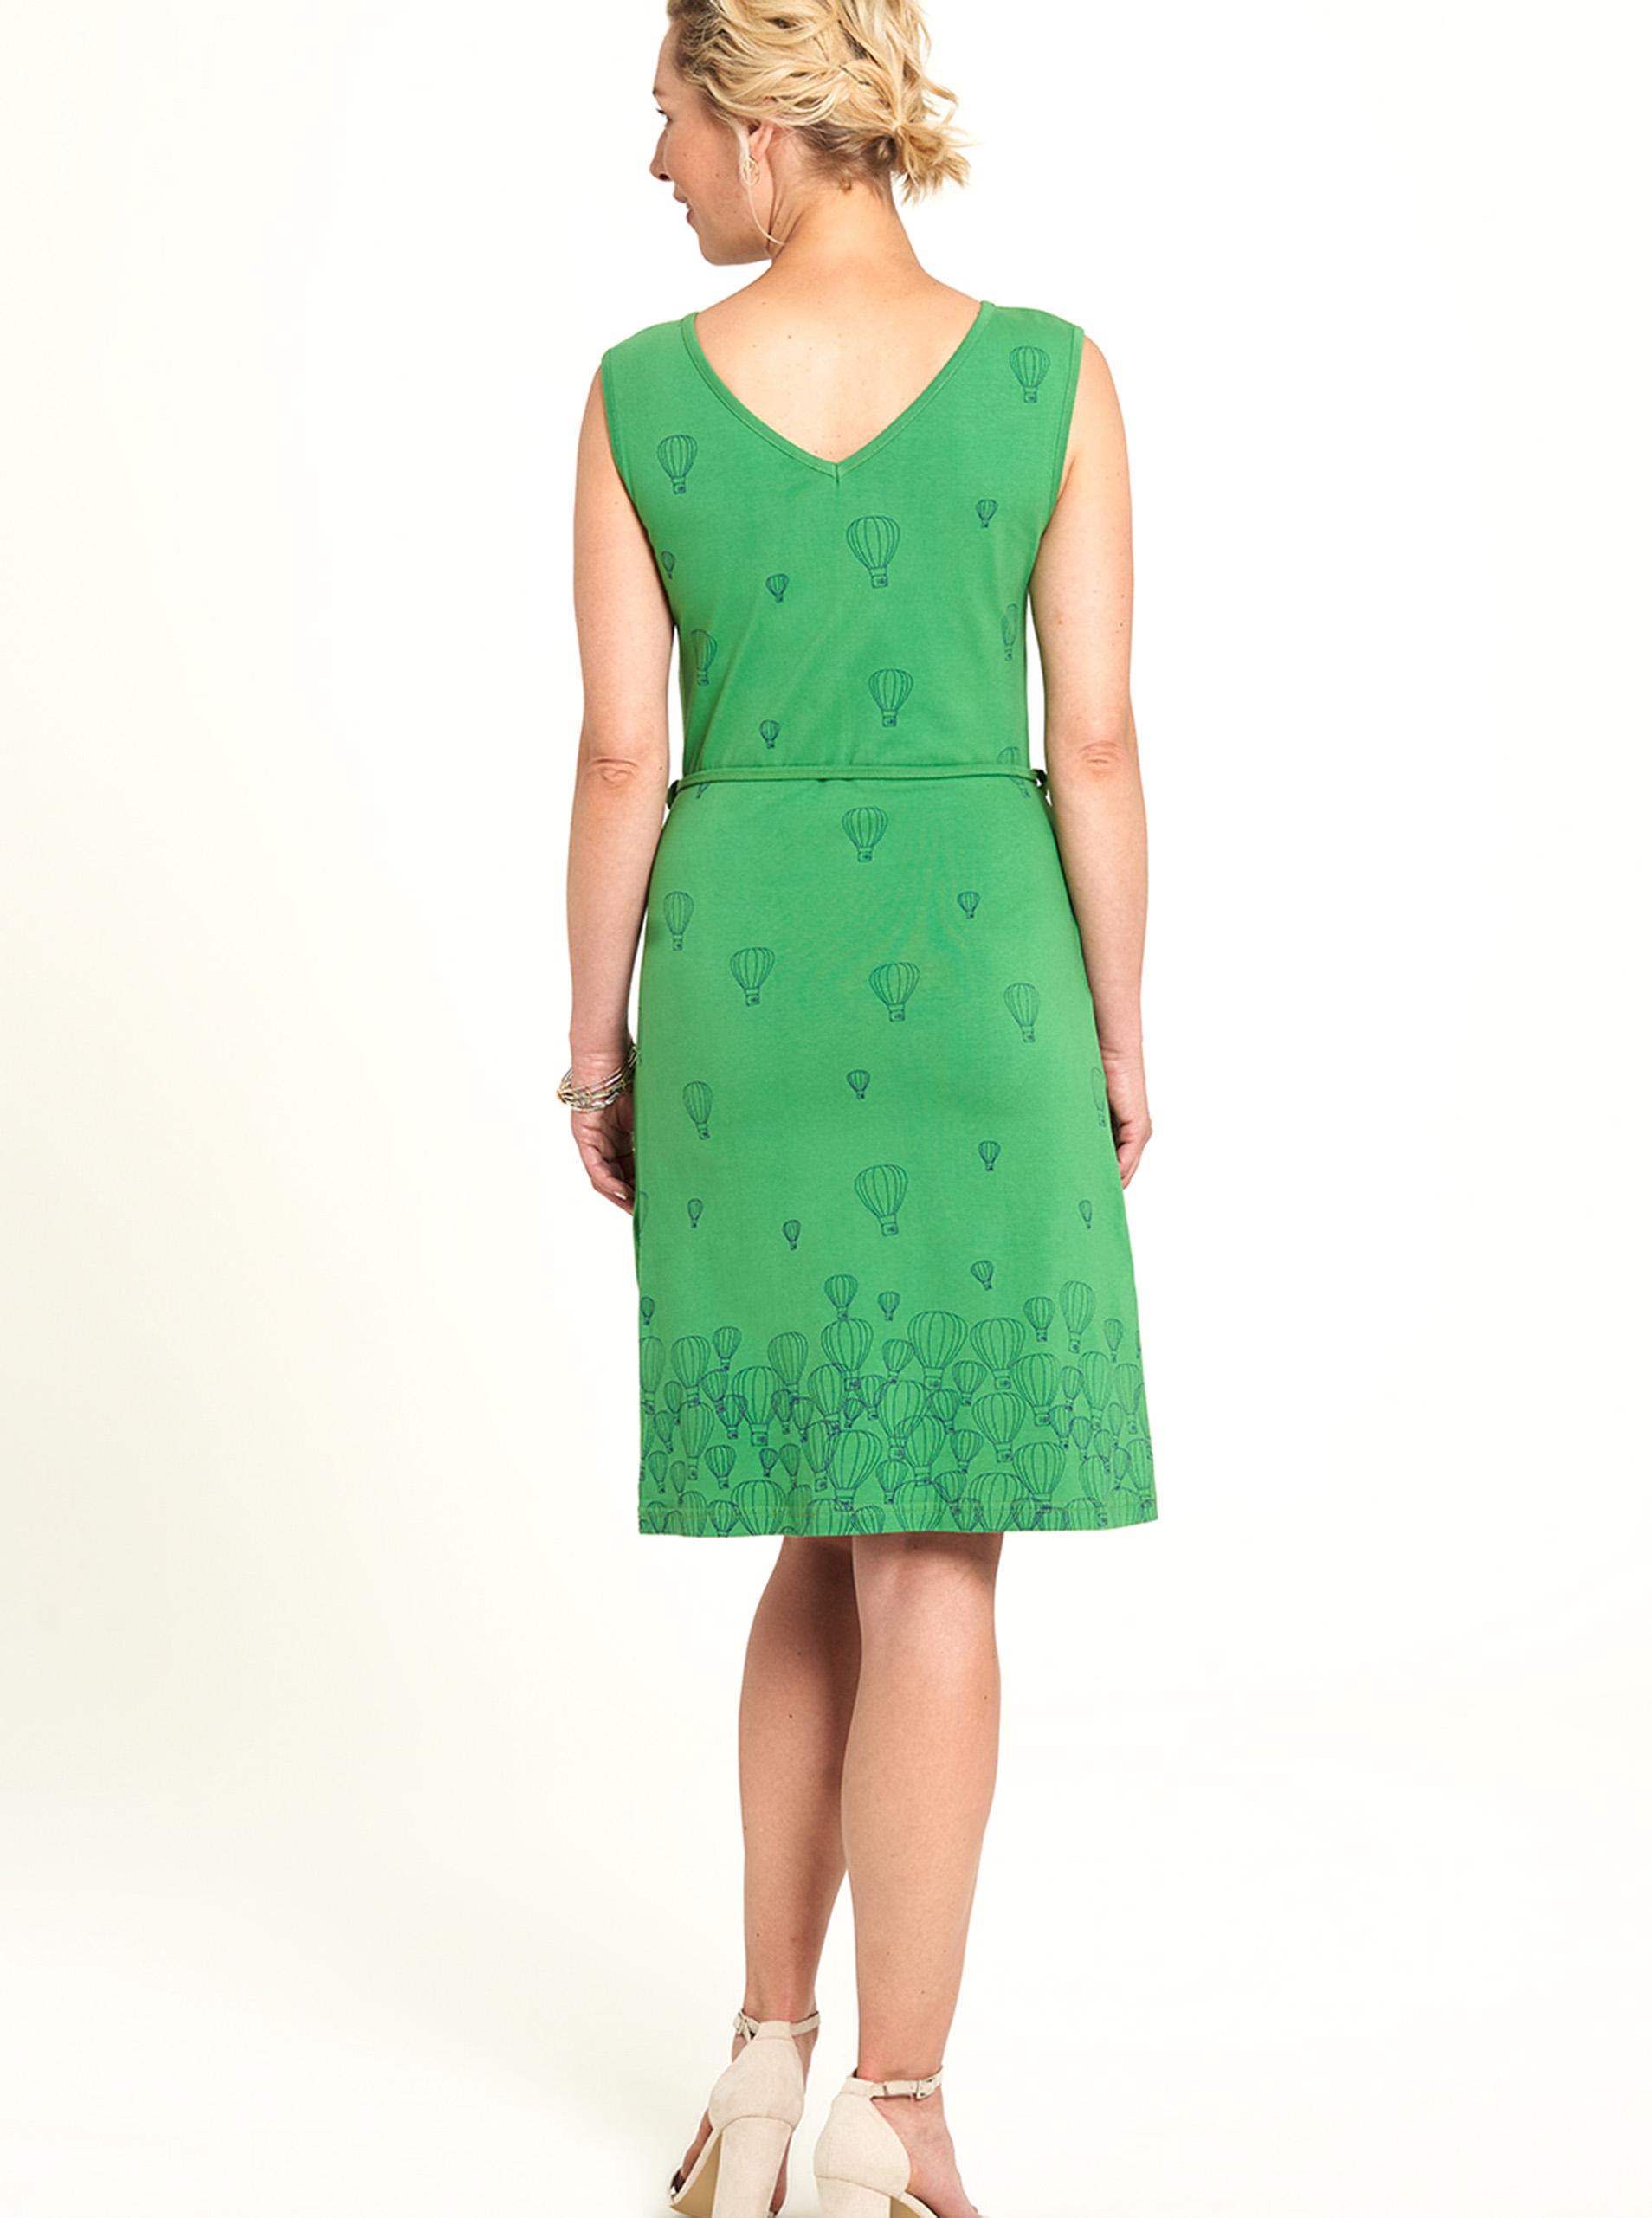 Tranquillo green dress patterned